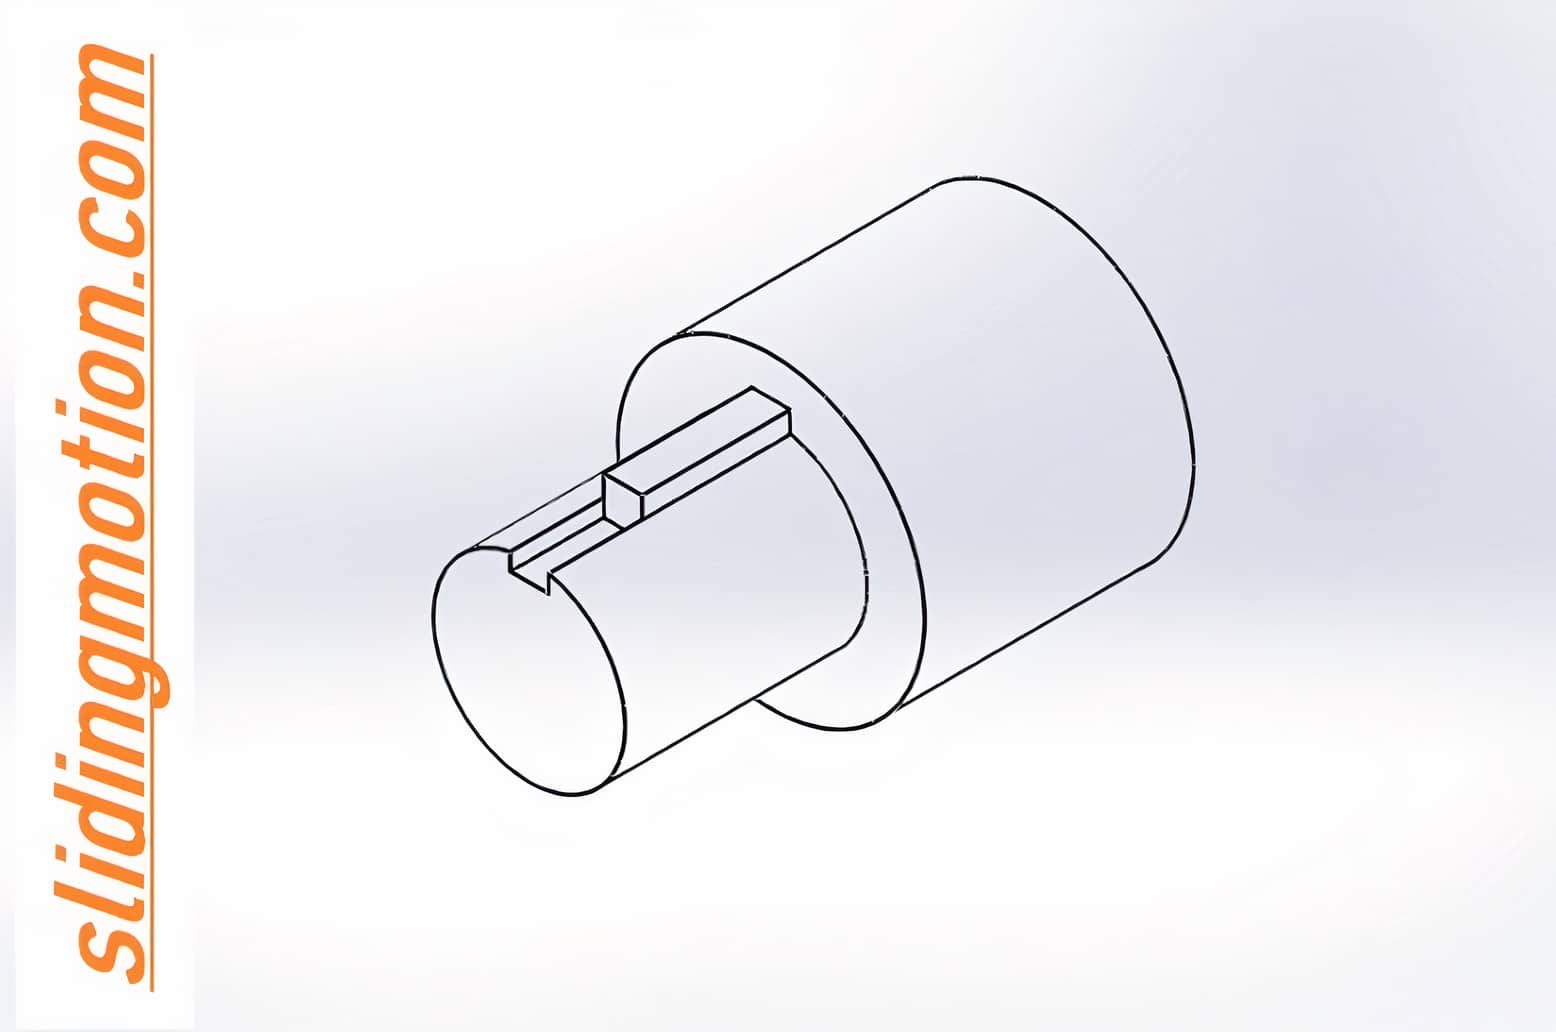 shaft key joint